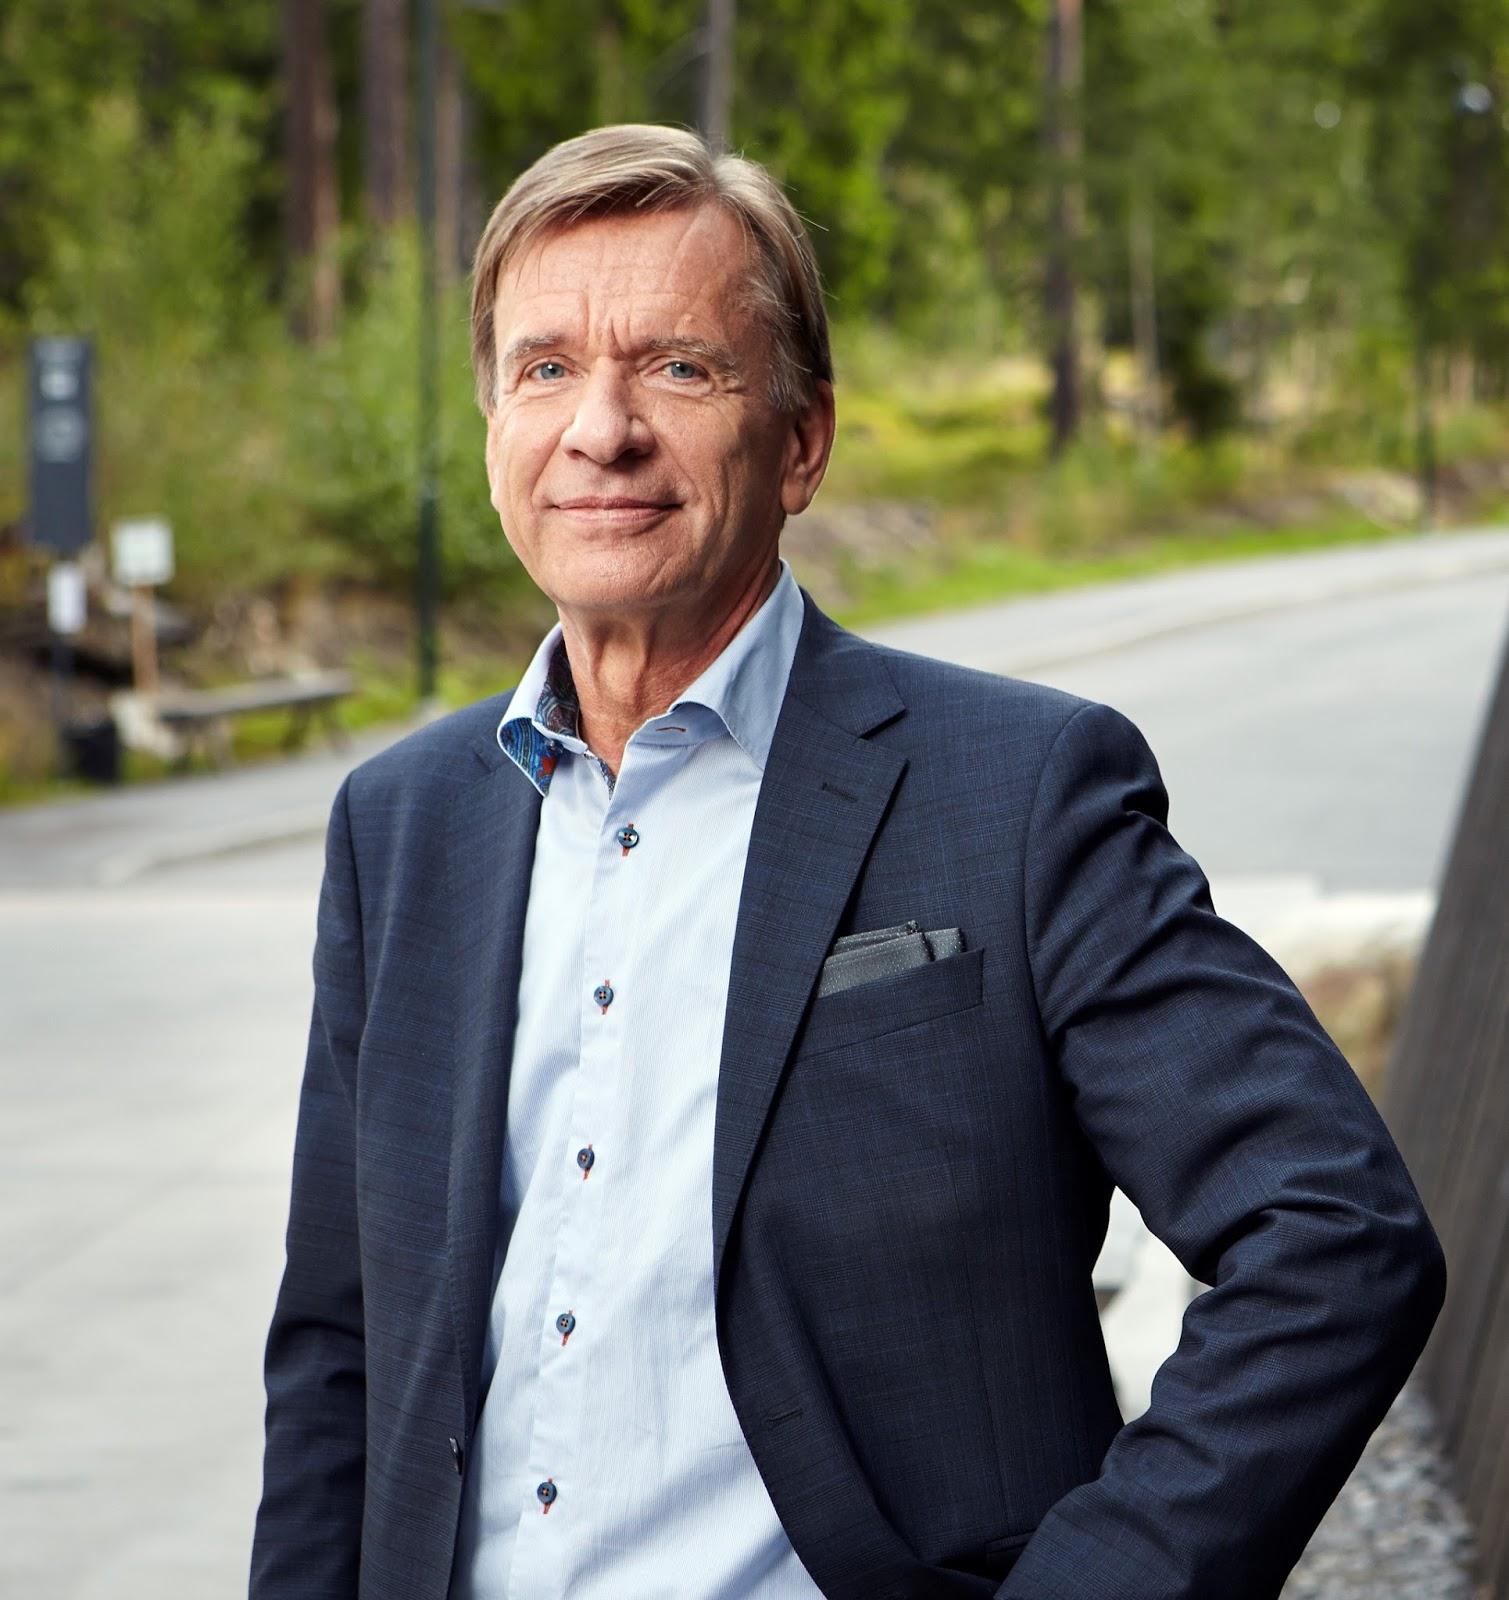 volvo 2016 3 1759269307 Η Volvo αναμένει ρεκόρ πωλήσεων και το 2016 Sales, Volvo, αγορά, πωλήσεις